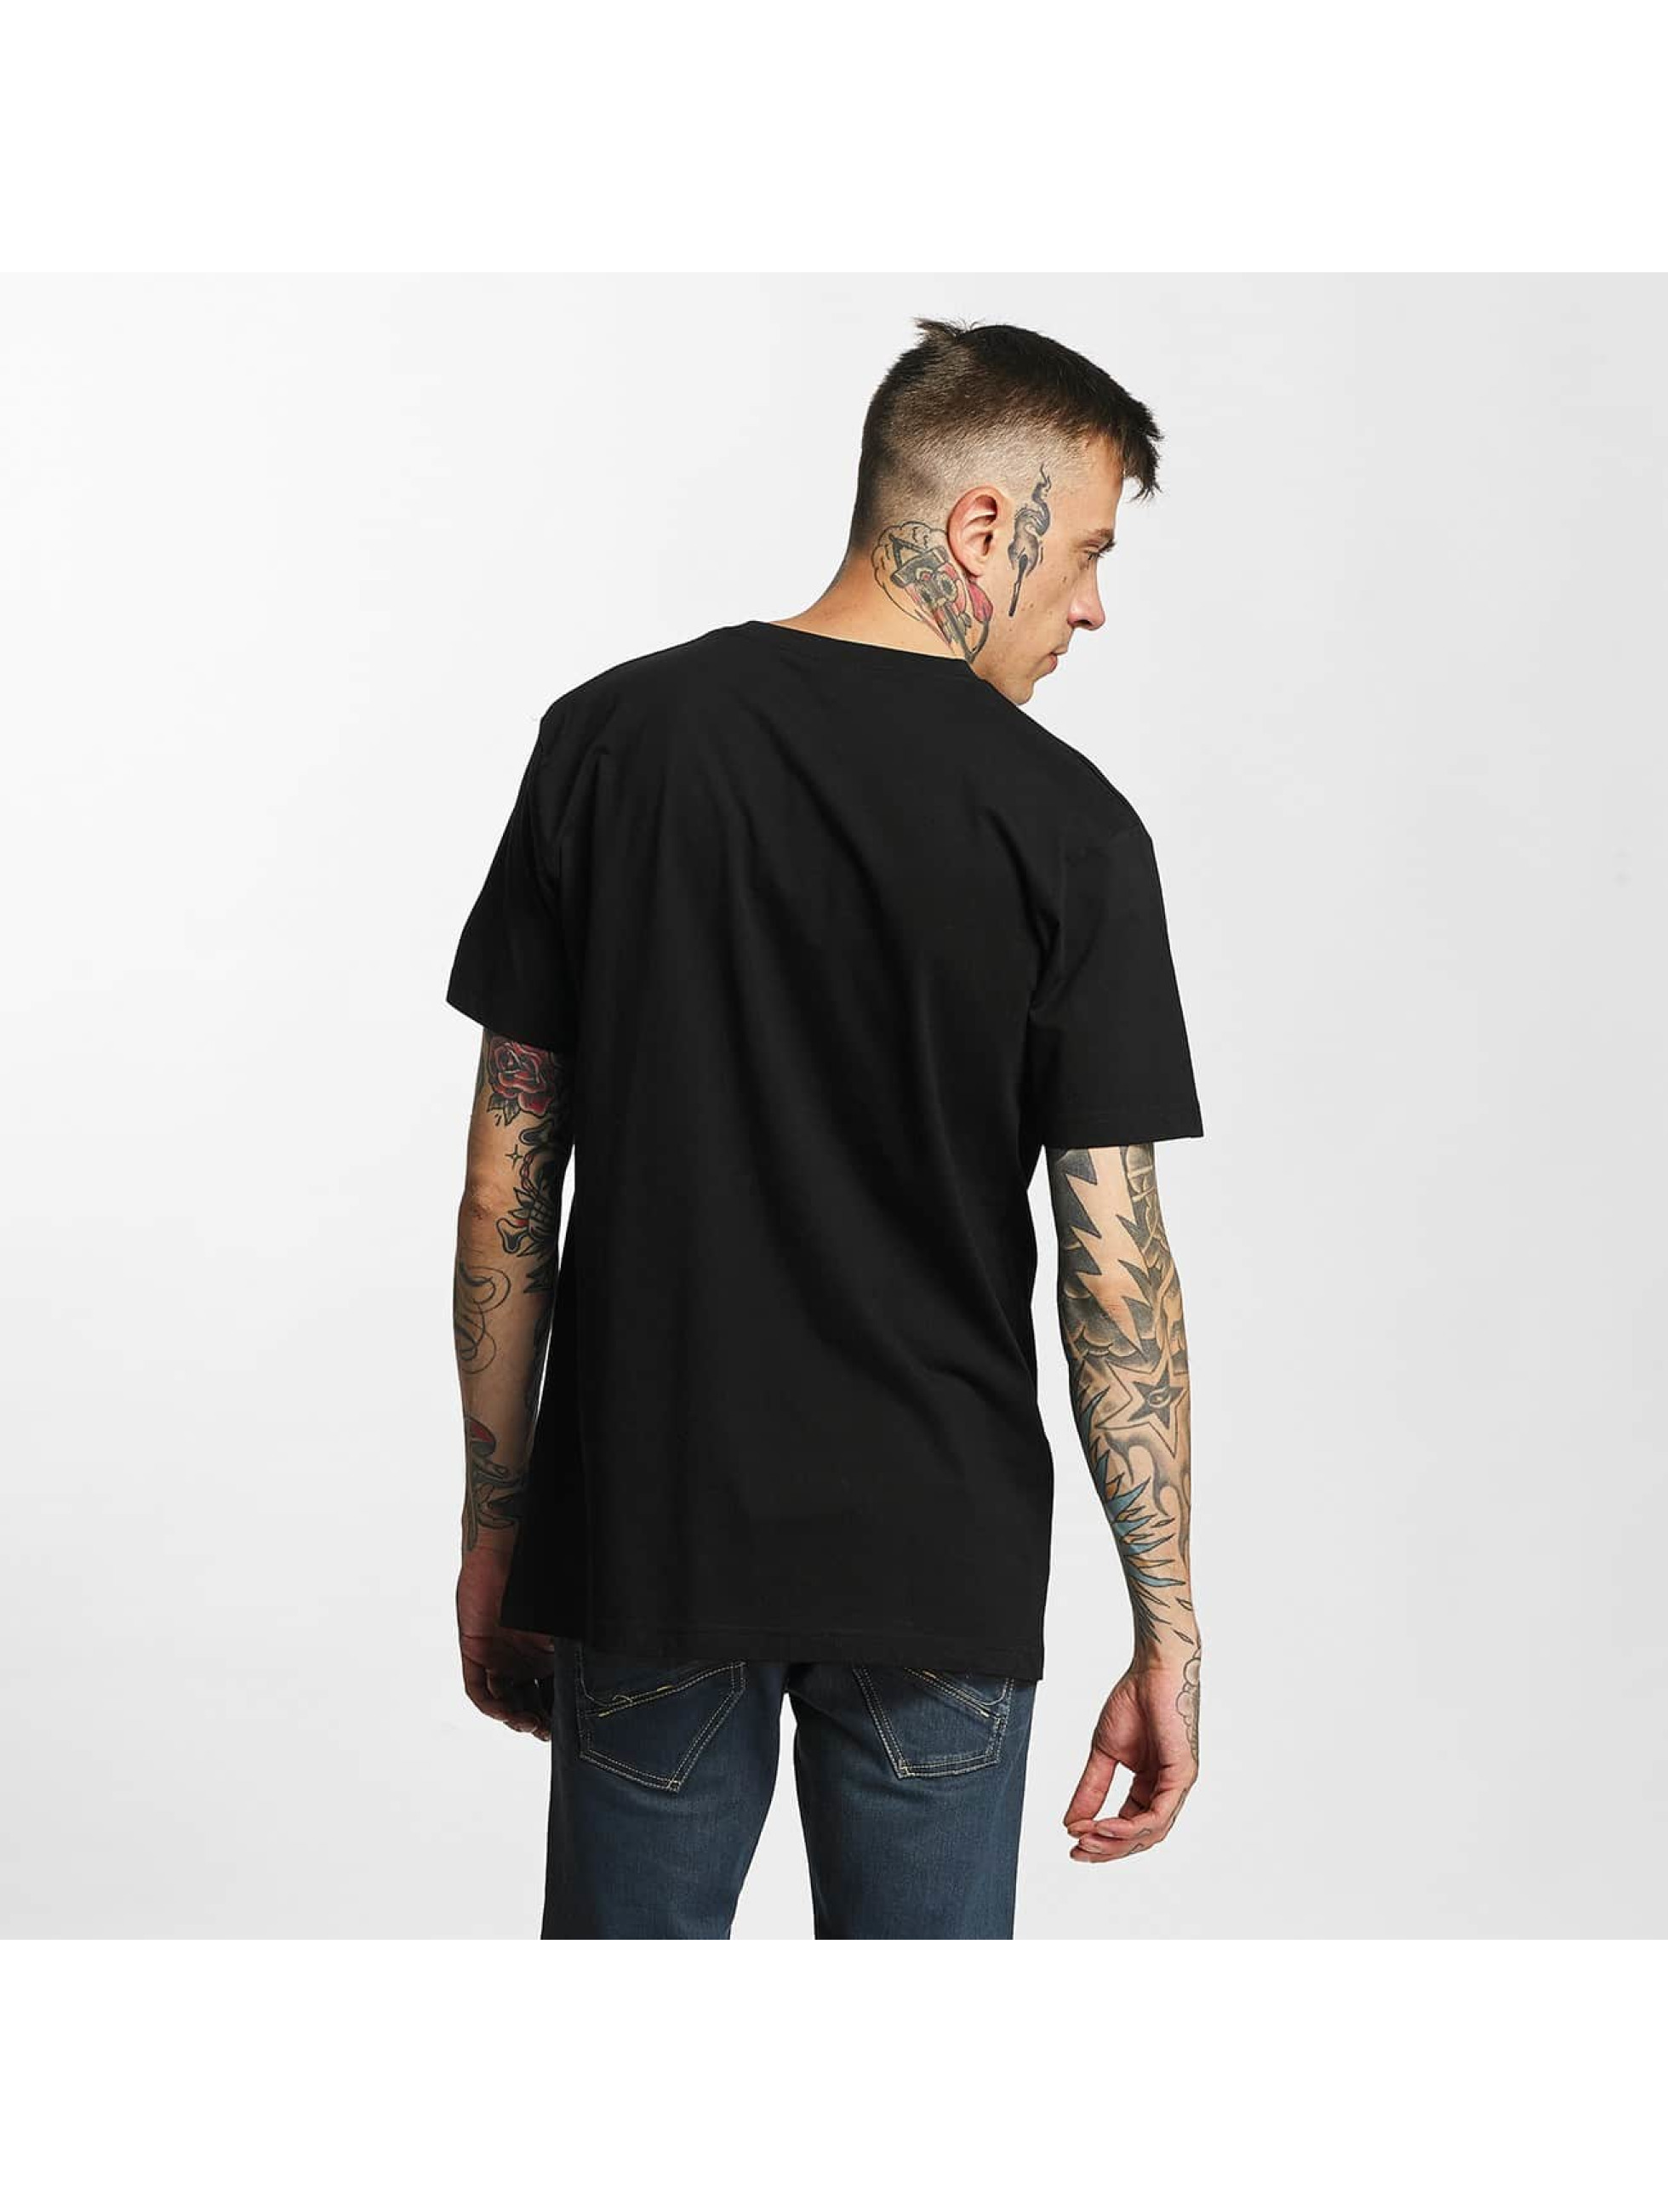 Mister Tee T-Shirt LA Rose schwarz